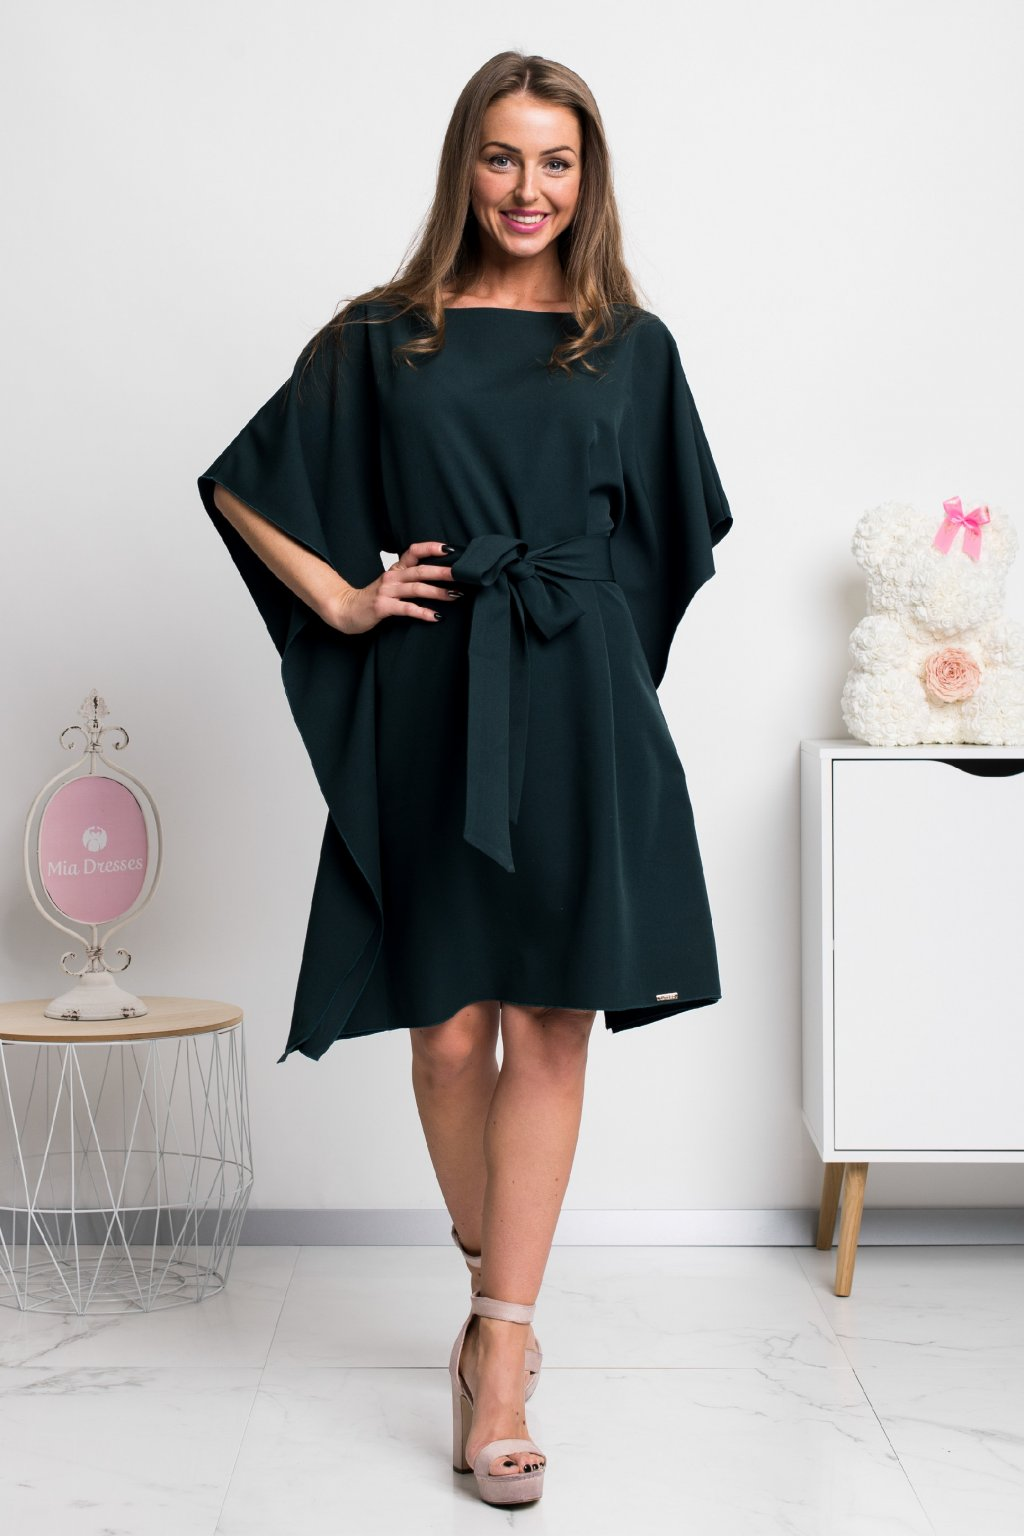 Tmavozelené krátke šaty s voľnými rukávmi